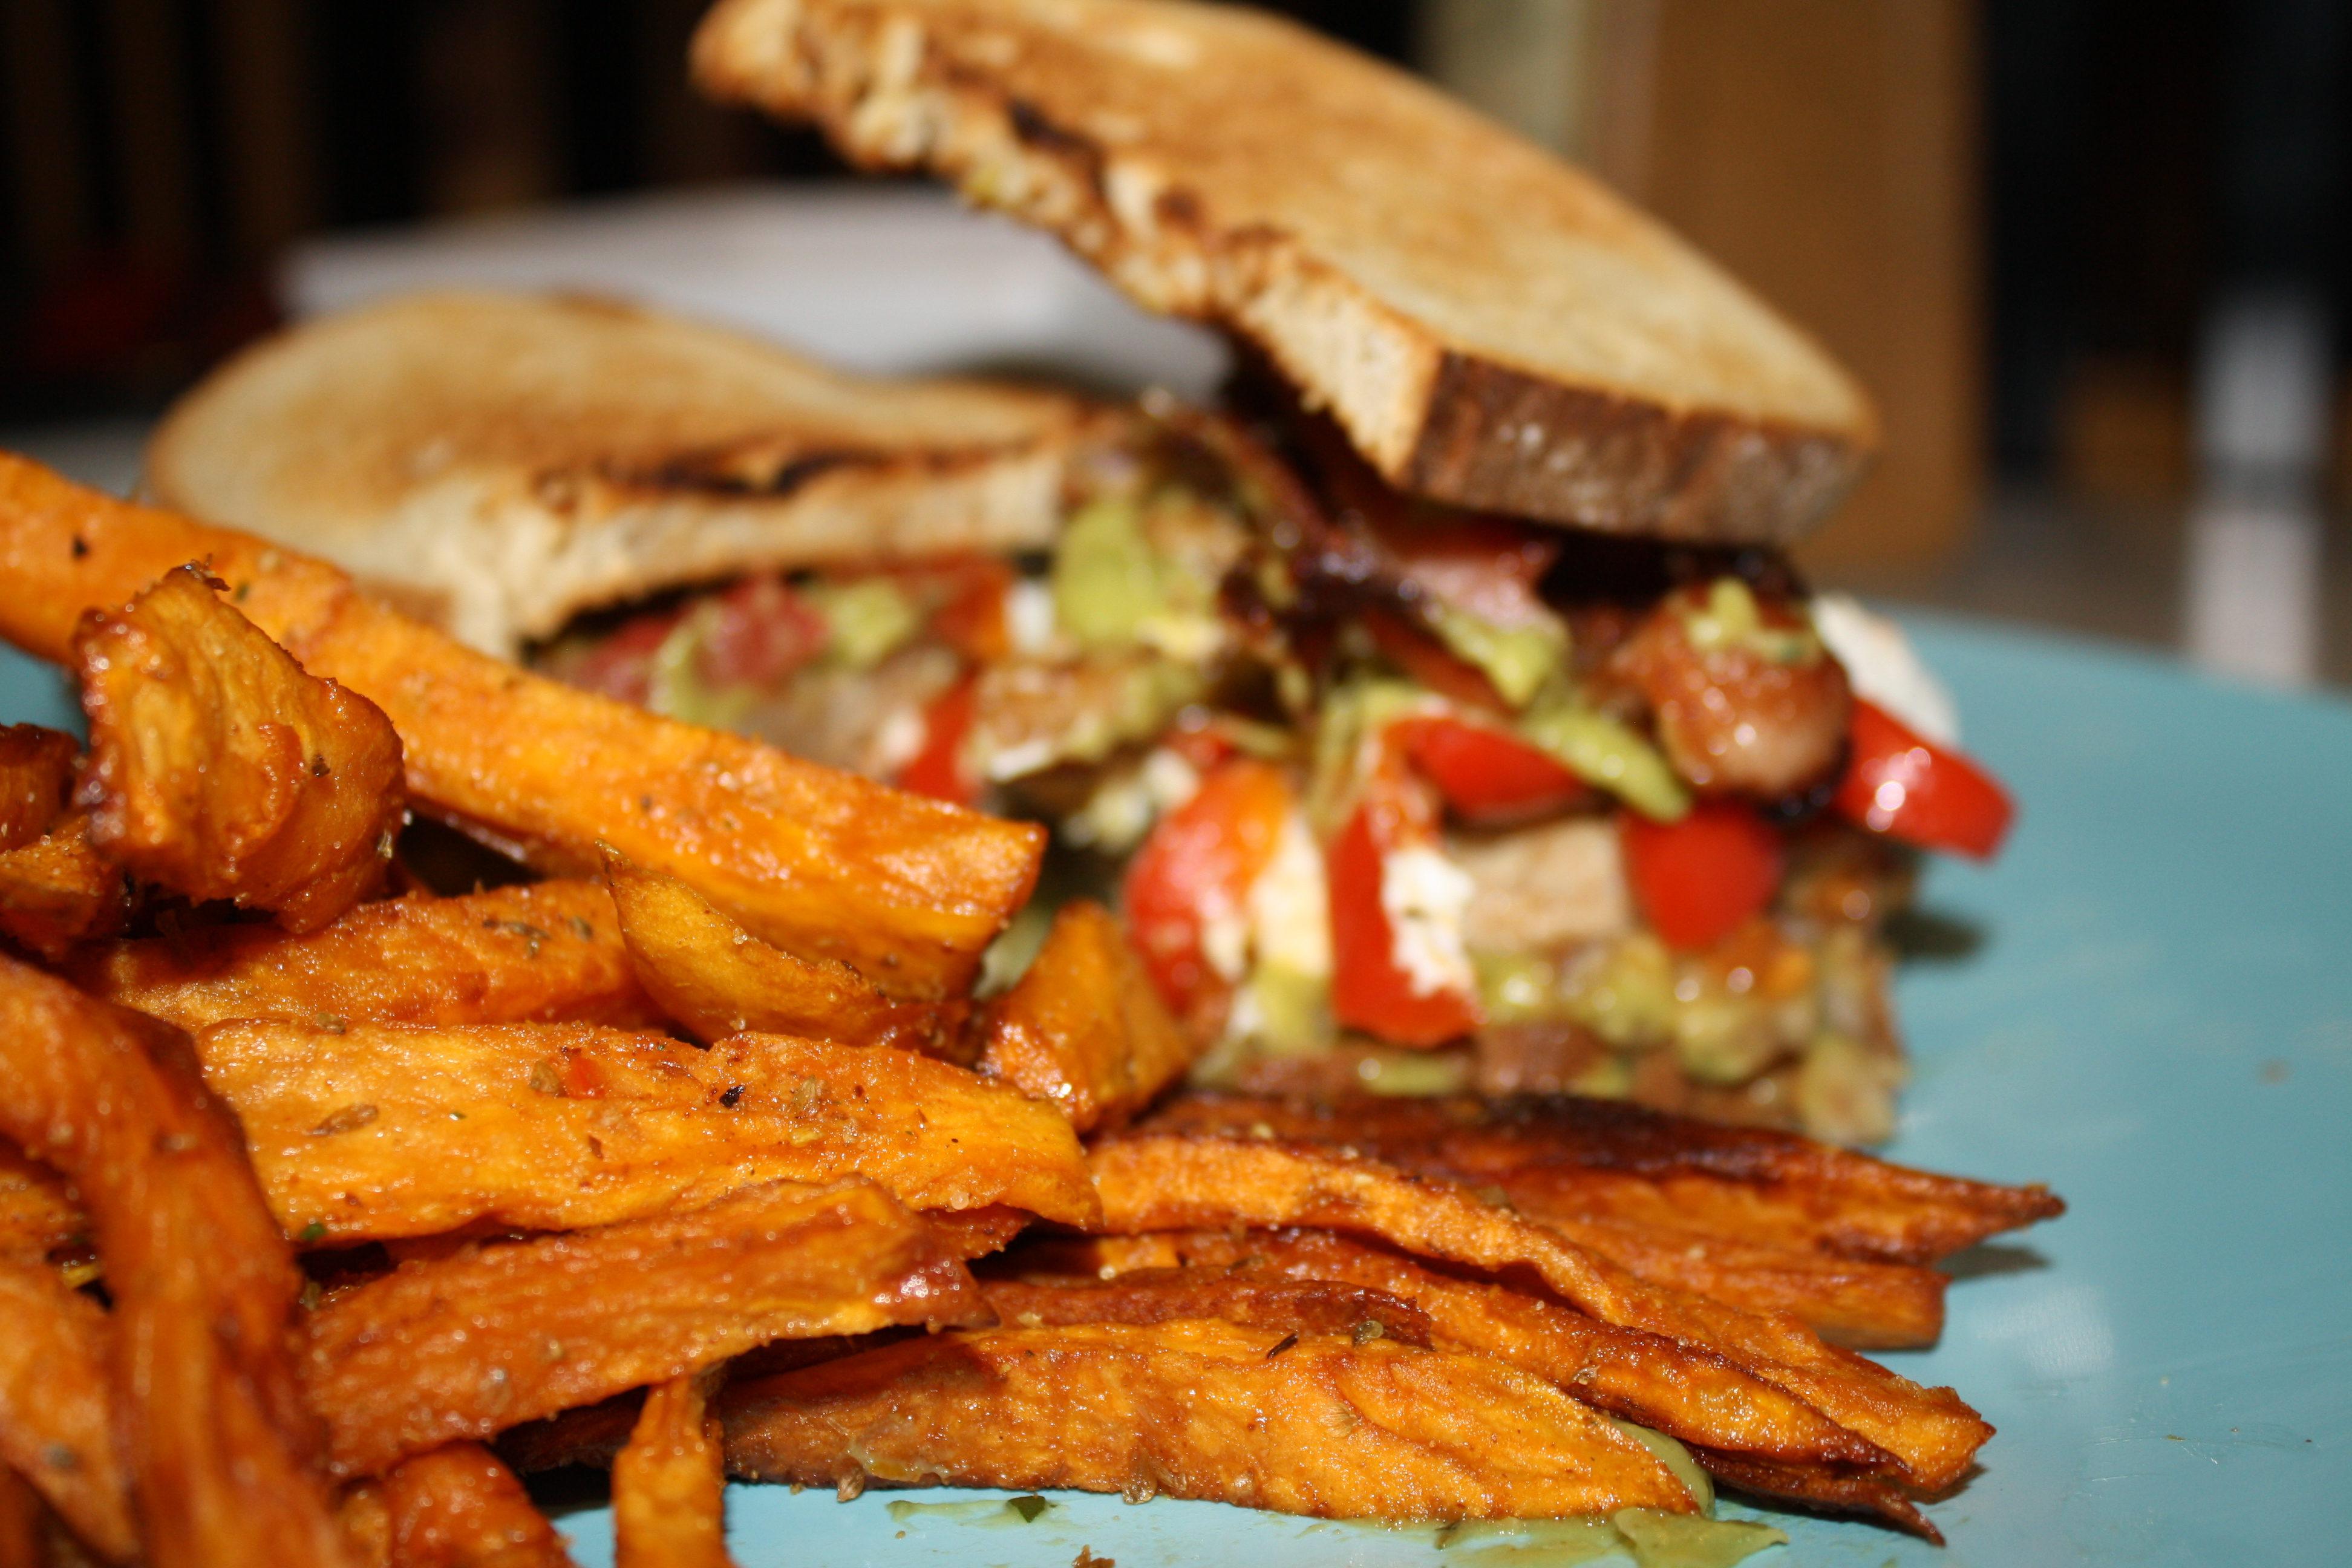 Jennifer's turkey burger and sweet potato fries start the summer off well